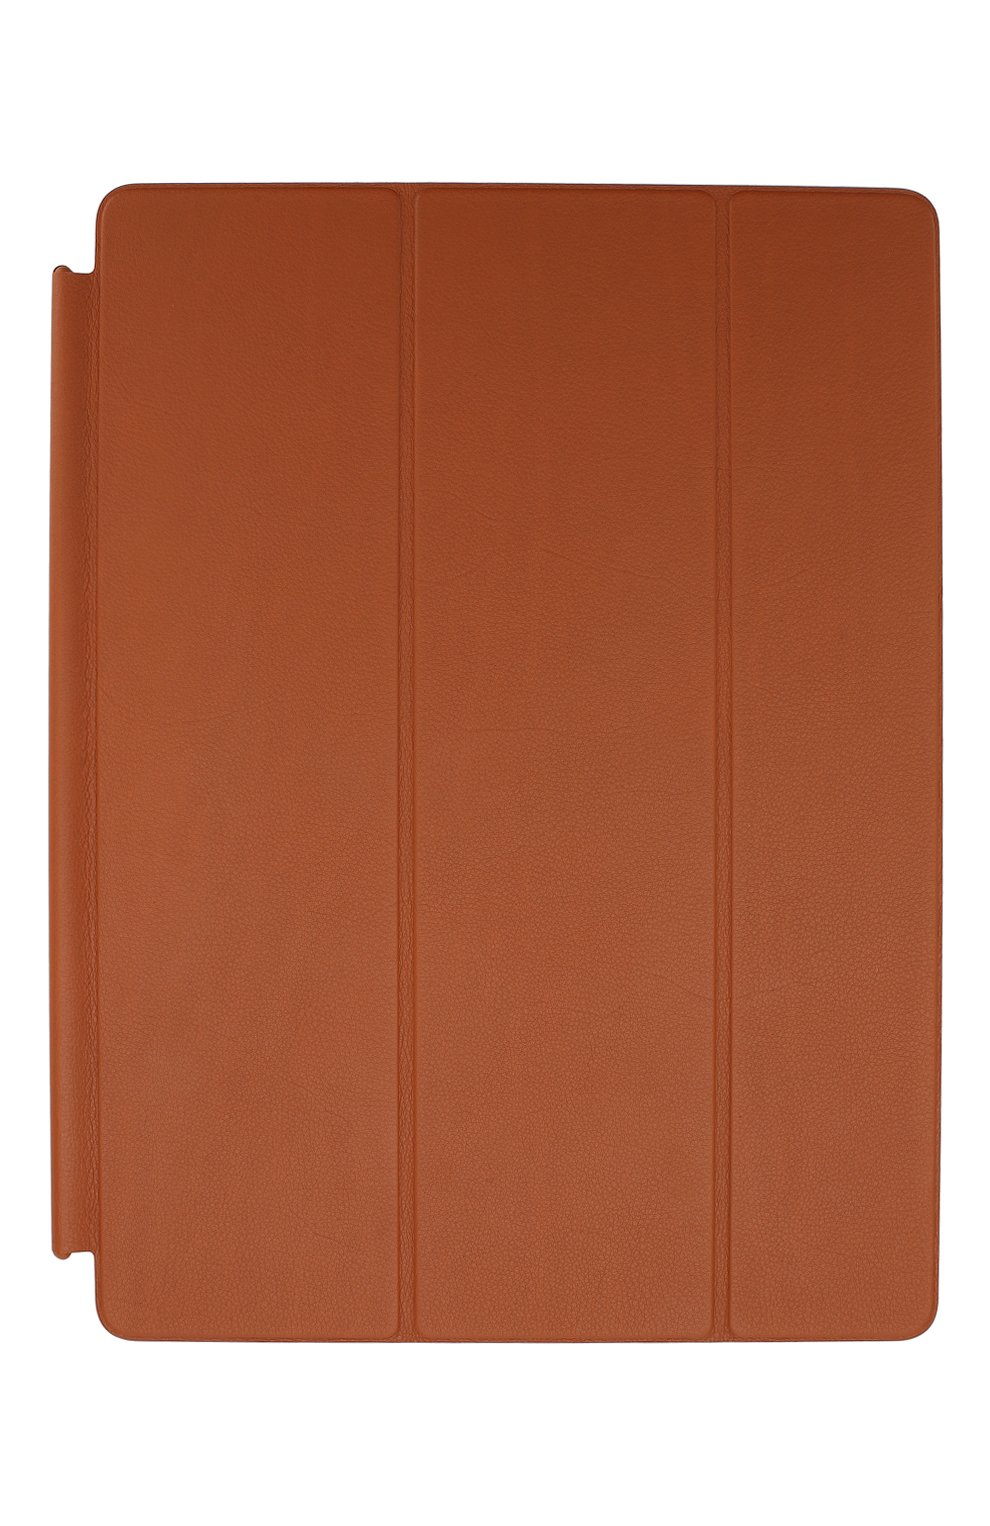 "Чехол smart cover для ipad pro 12.9"" APPLE  коричневого цвета, арт. MPV12ZM/A | Фото 1"